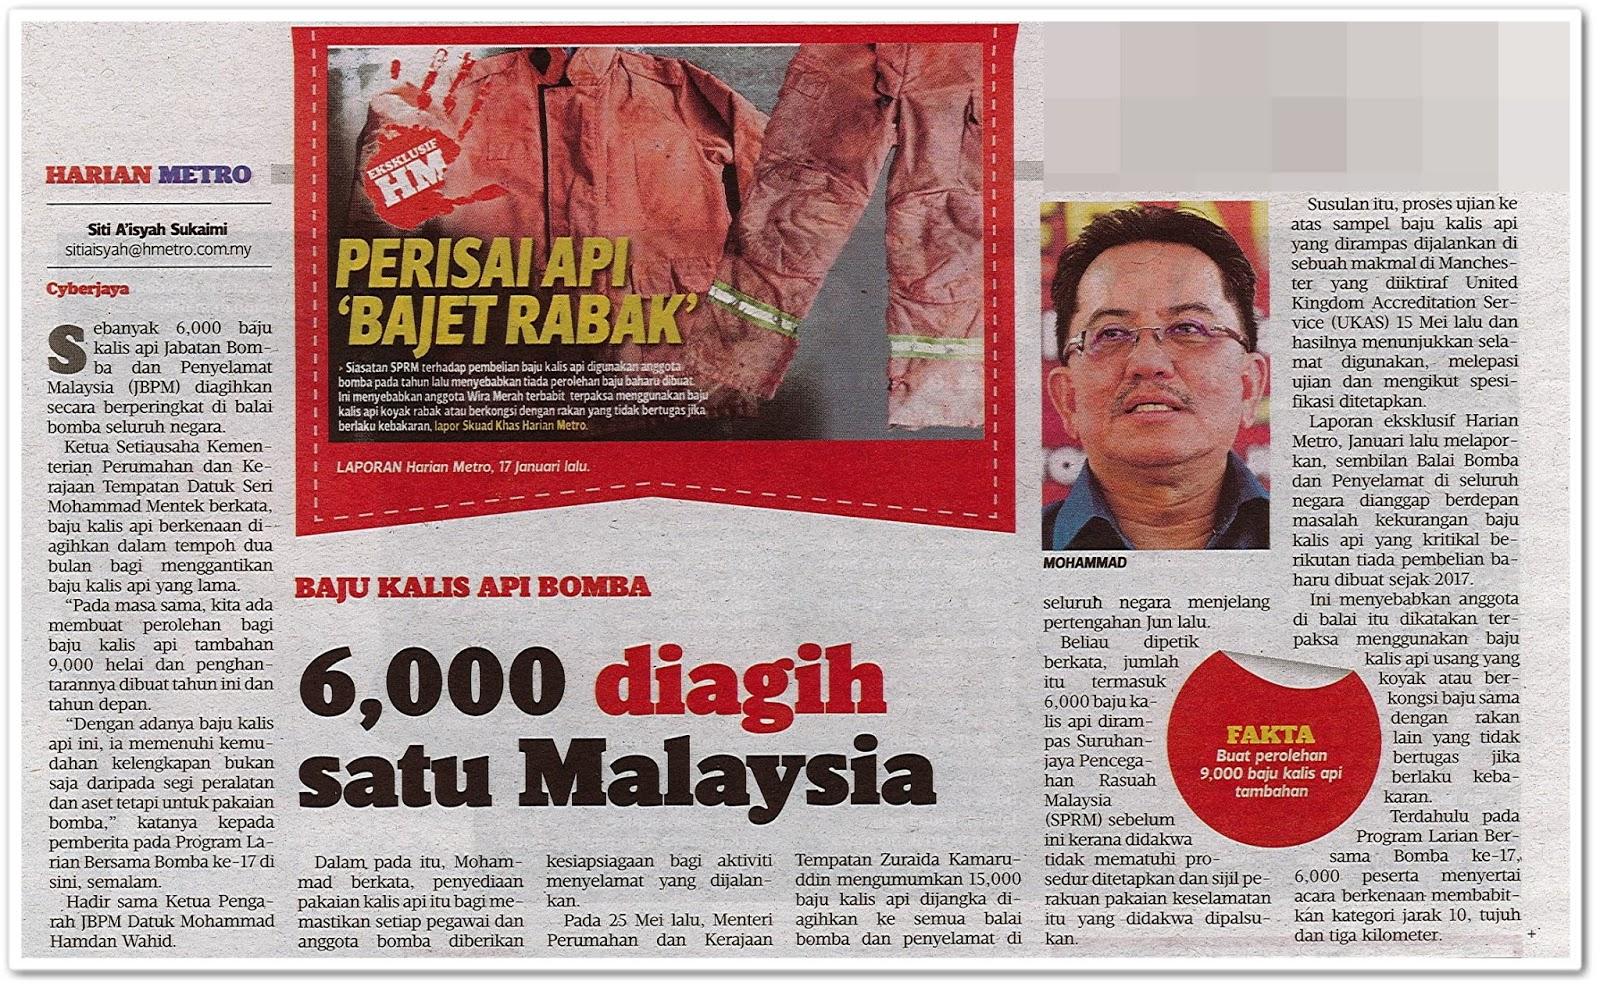 Baju kalis api bomba : 6,000 diagih satu Malaysia - Keratan akhbar Harian Metro 19 Ogos 2019